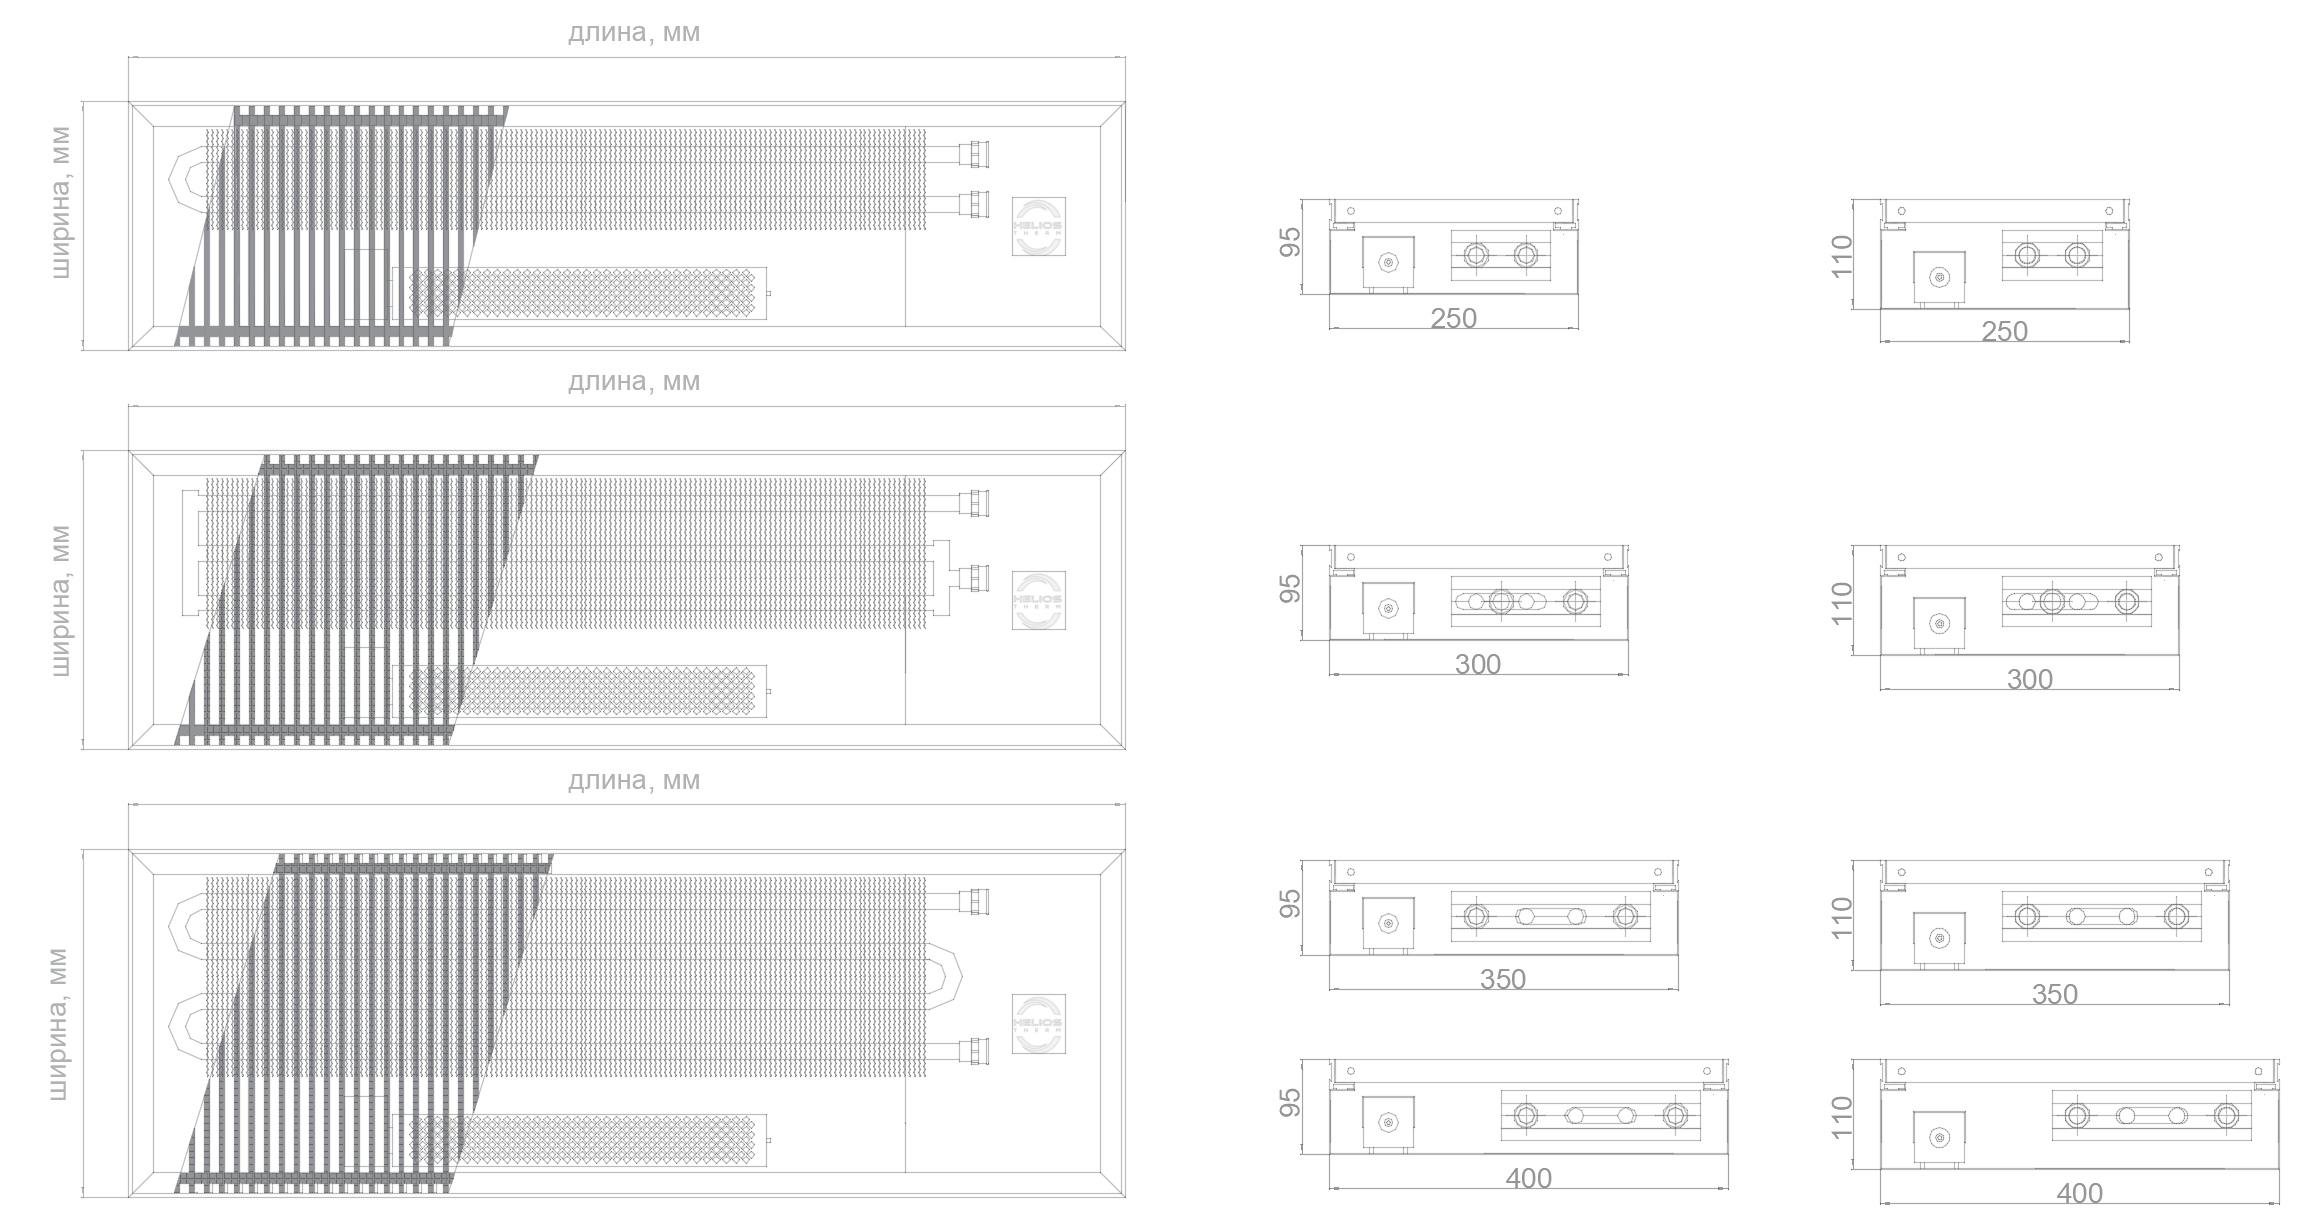 Схема конвектора CIAA шириной 250 мм, 300 мм, 350 мм и 400 мм